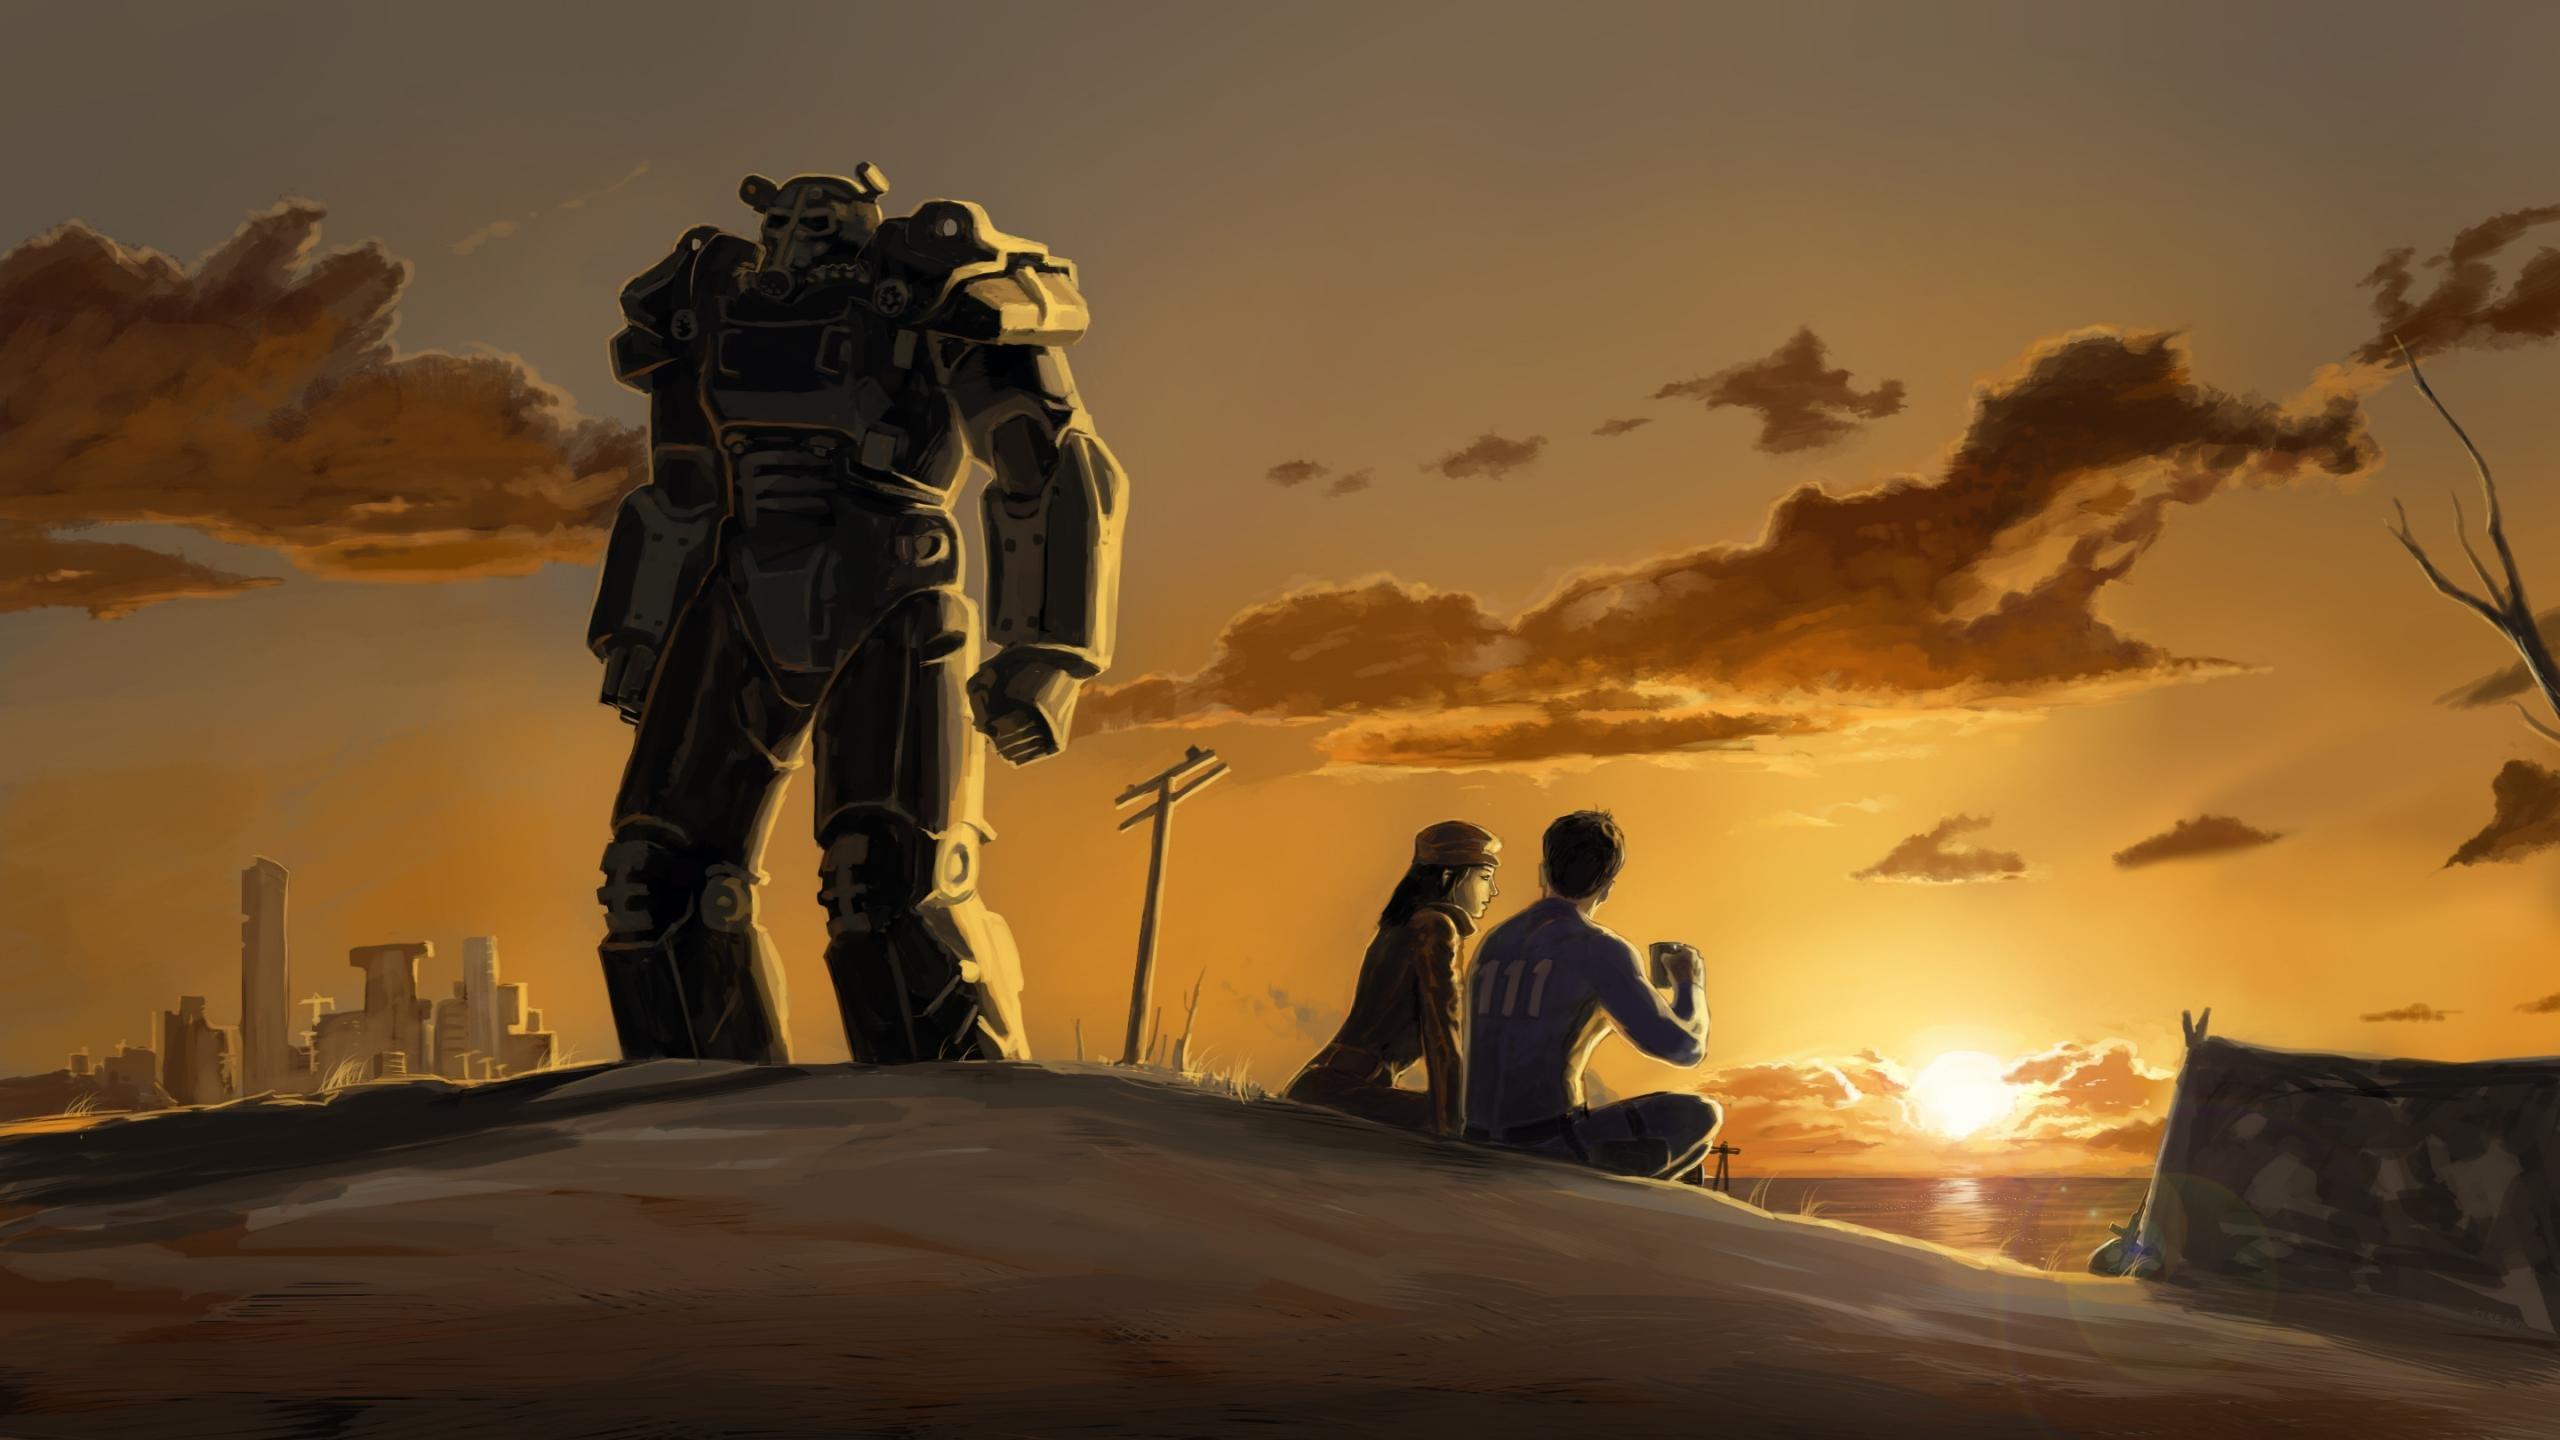 Fallout 4 Wallpapers 2560x1440 Desktop Backgrounds